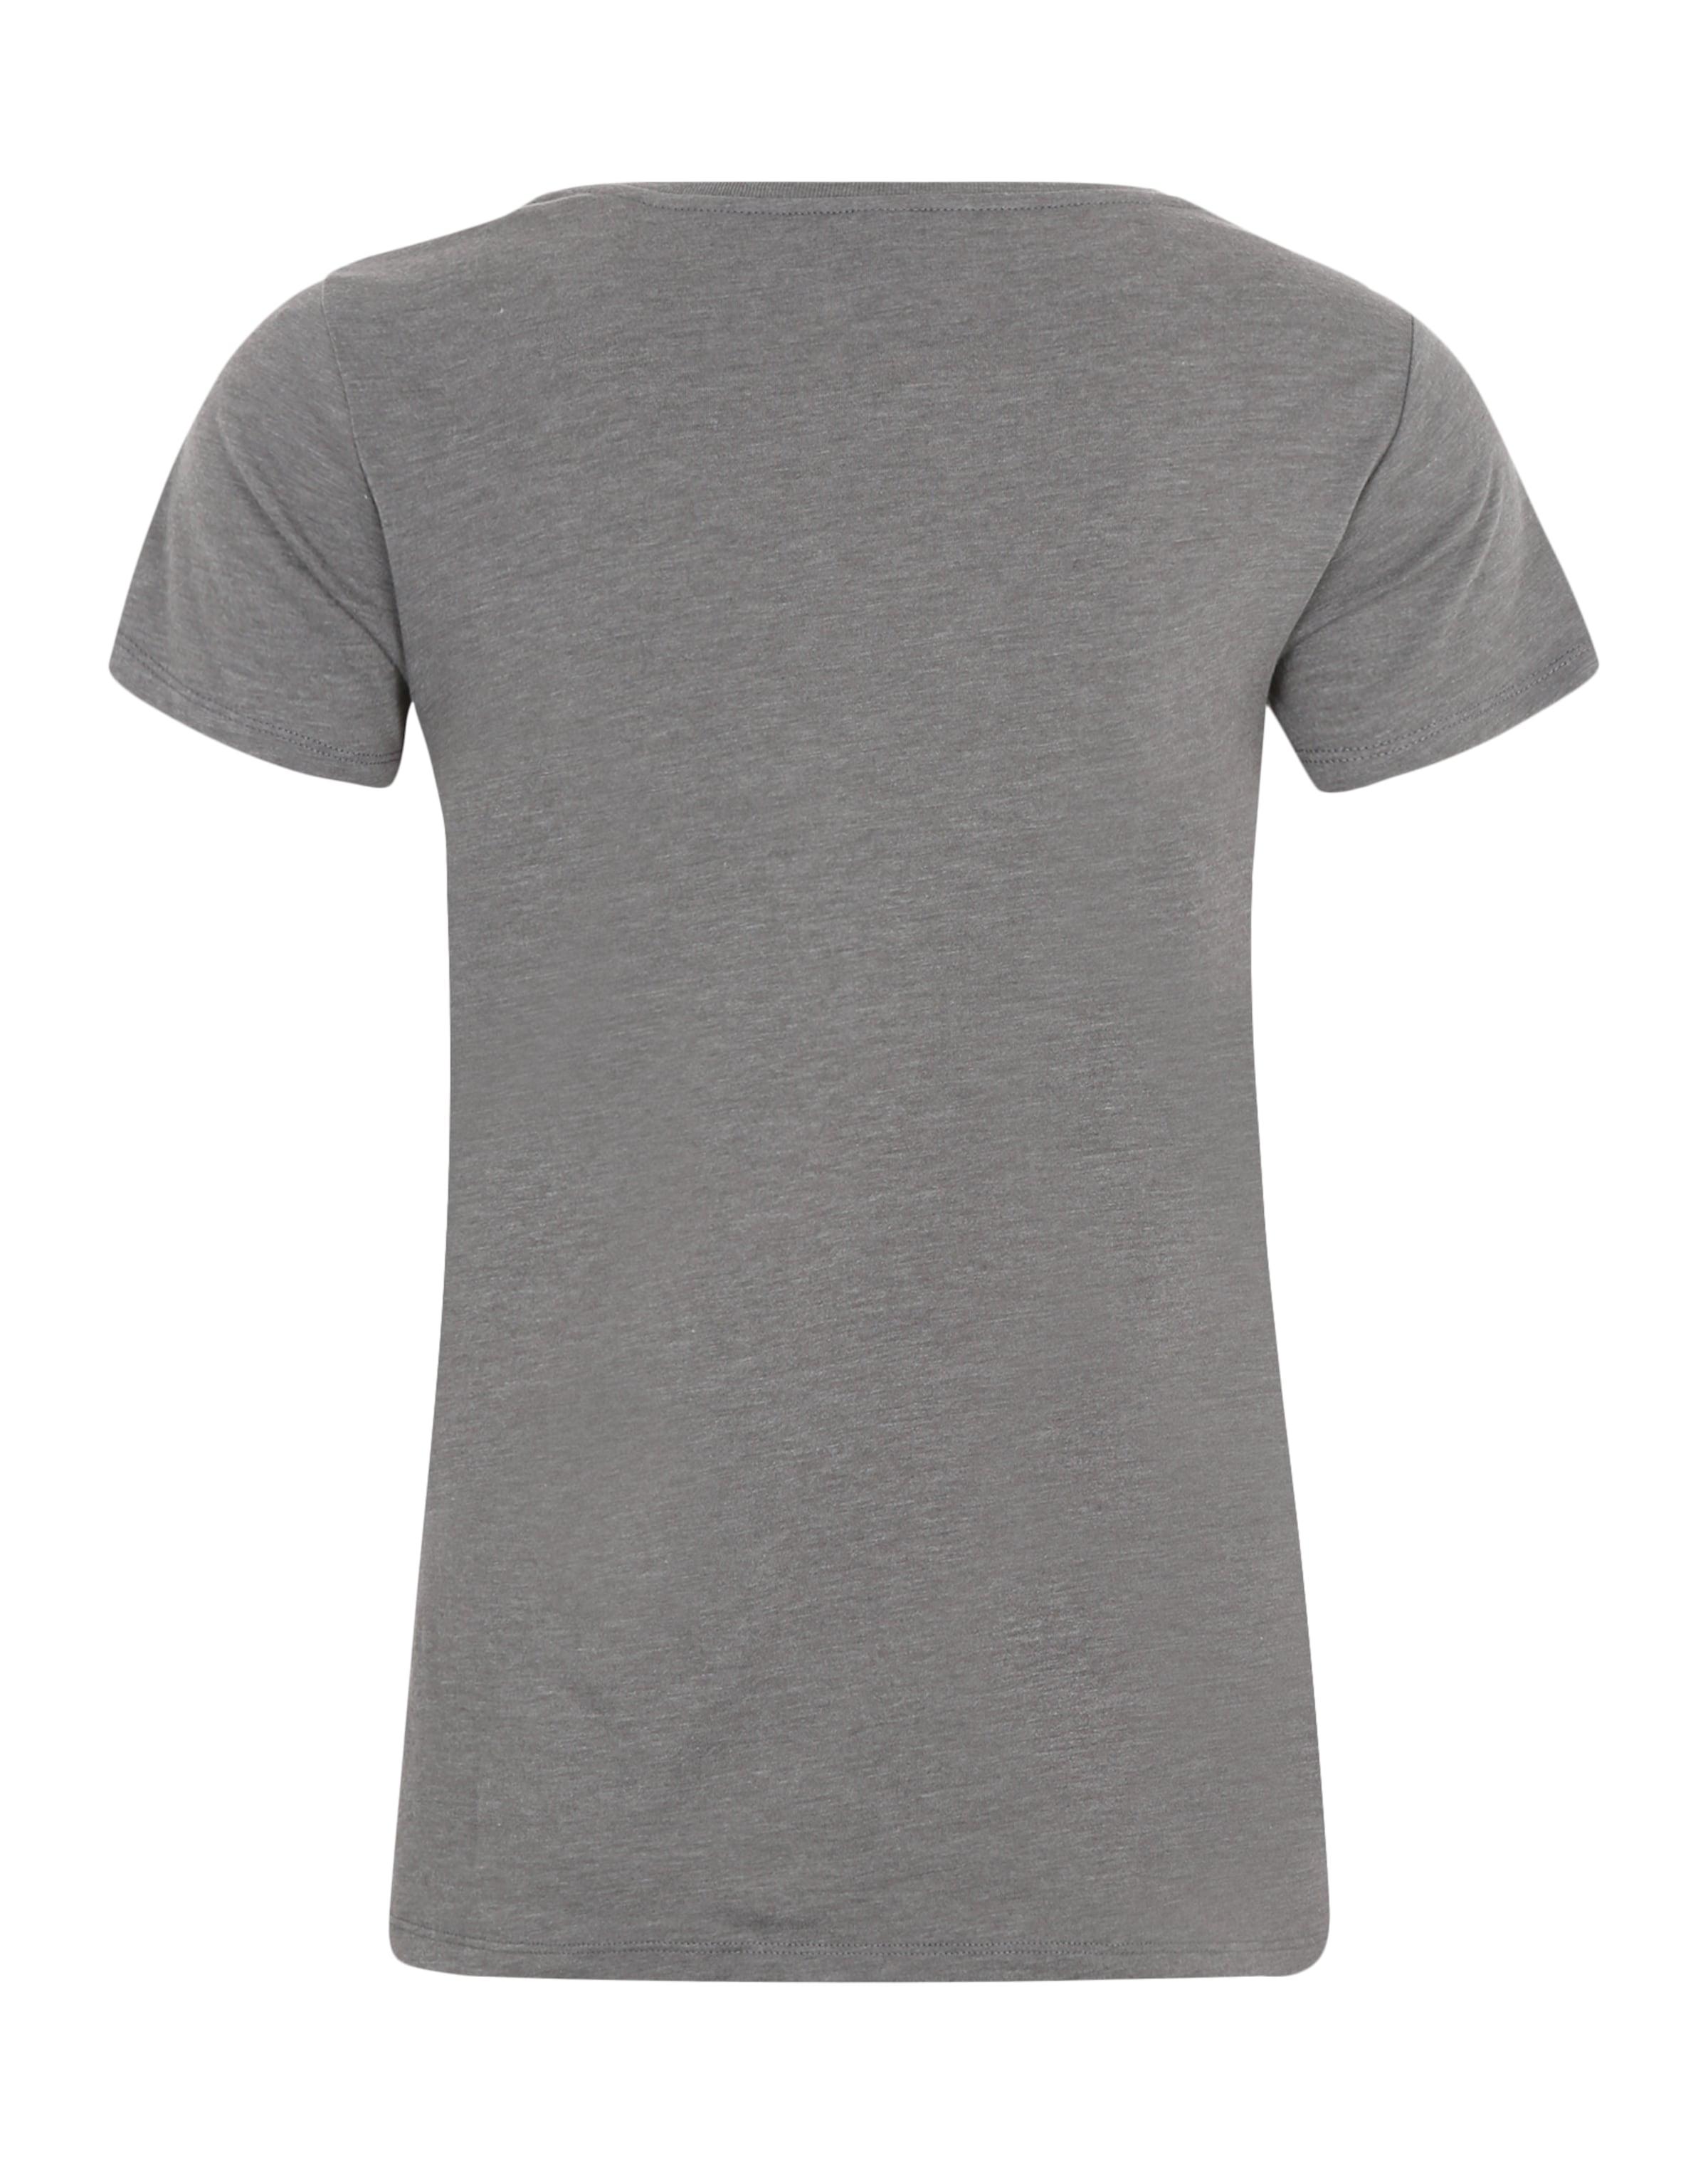 GraumeliertWeiß Iriedaily 'blowball' T In shirt m8Nnv0w